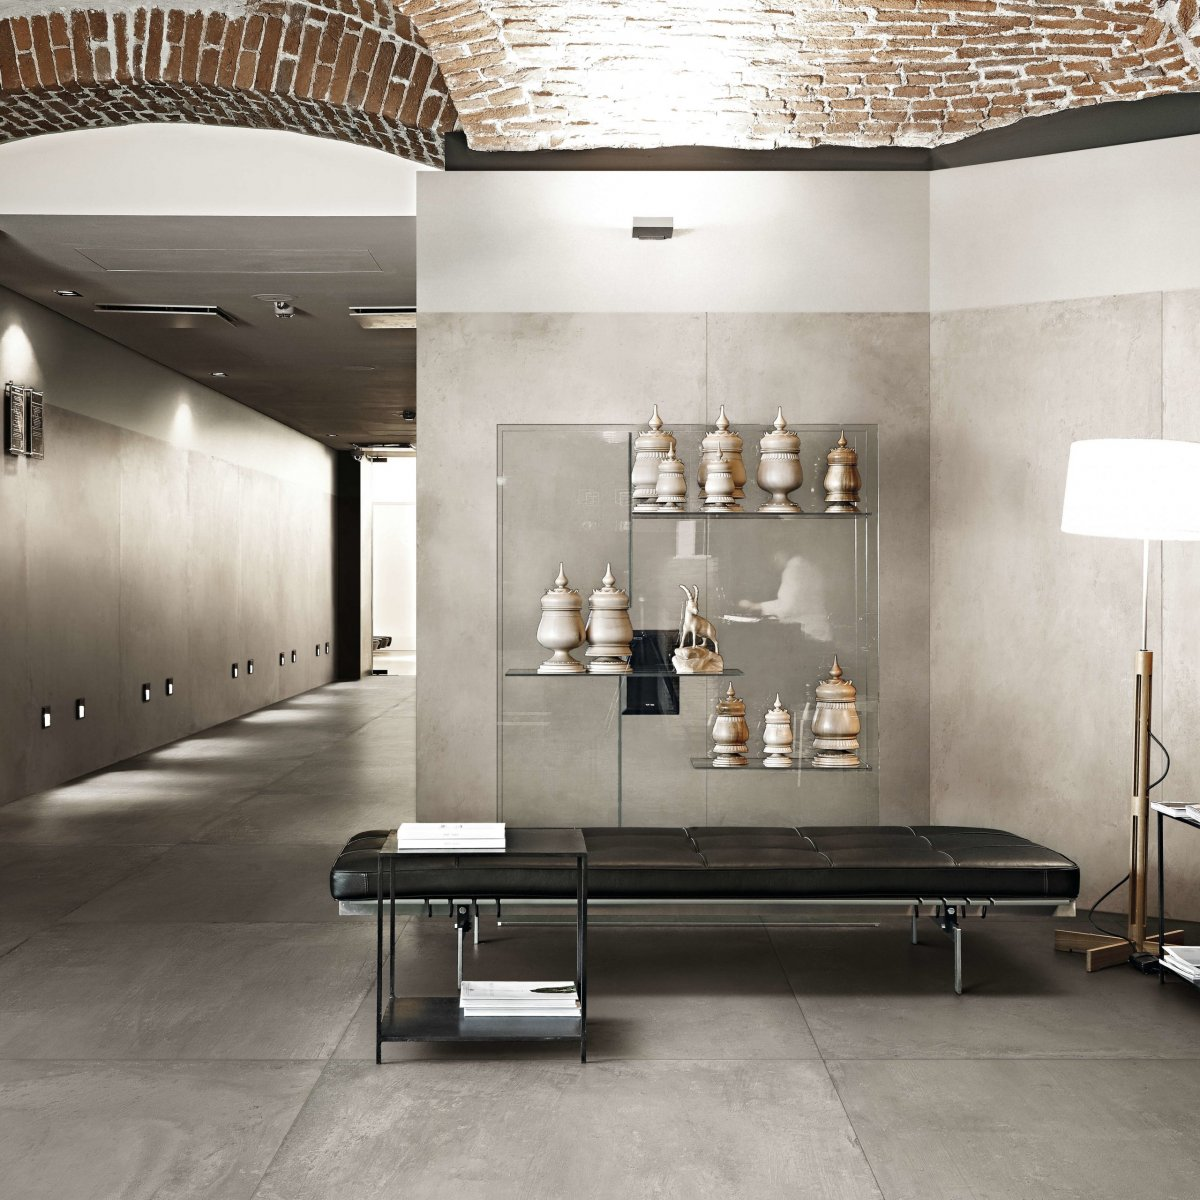 Florim Beton One Greige 600x600mm_Stiles_Lifestyle_Image2